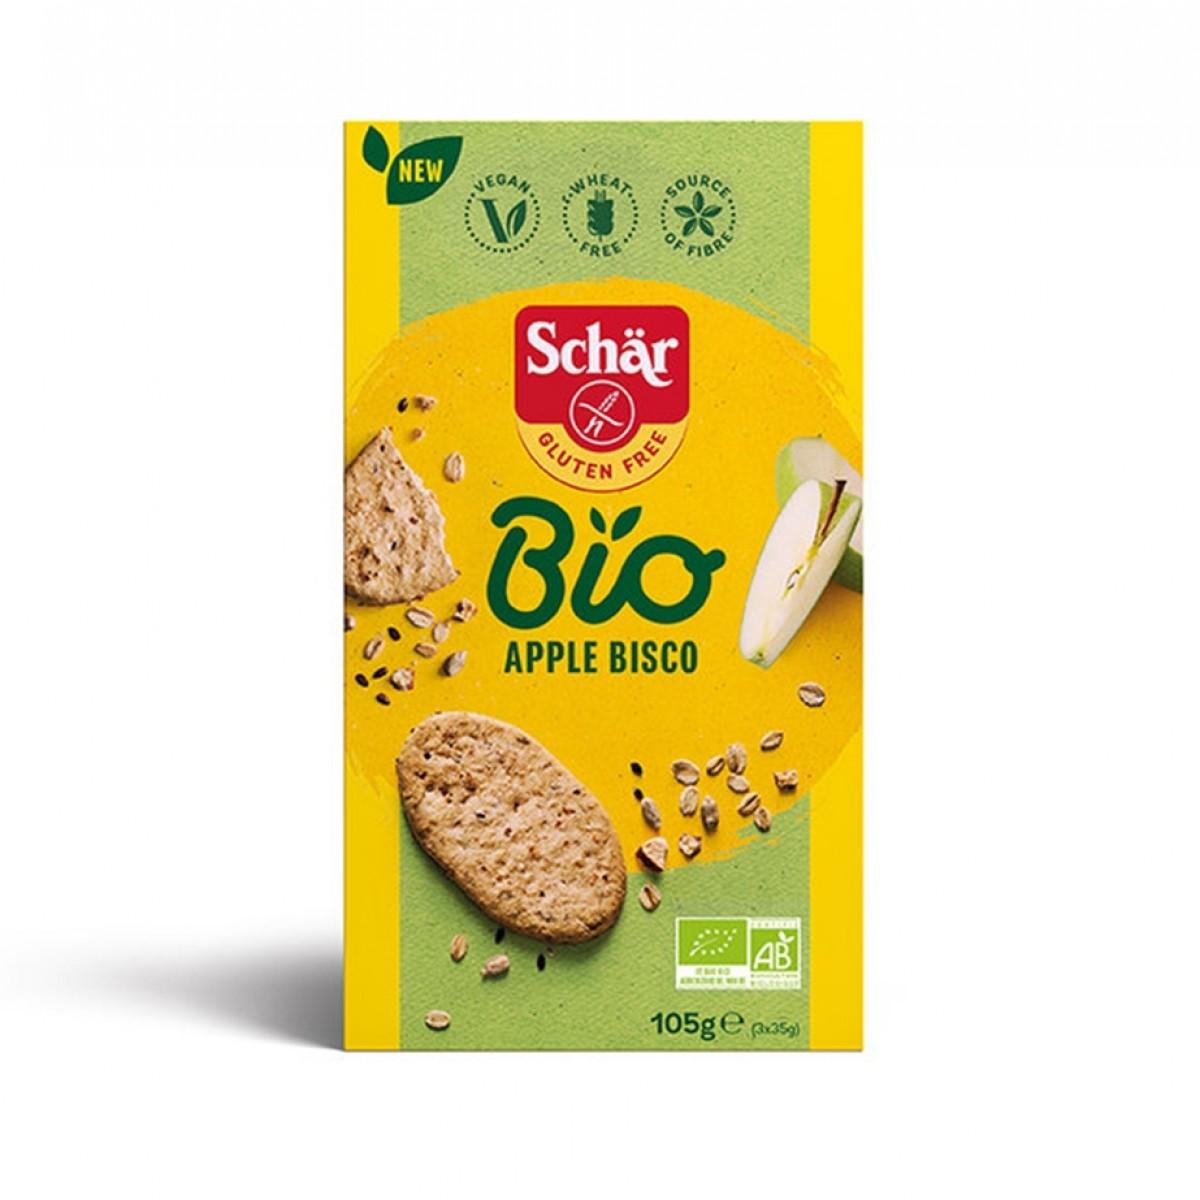 Apple Bisco Bio